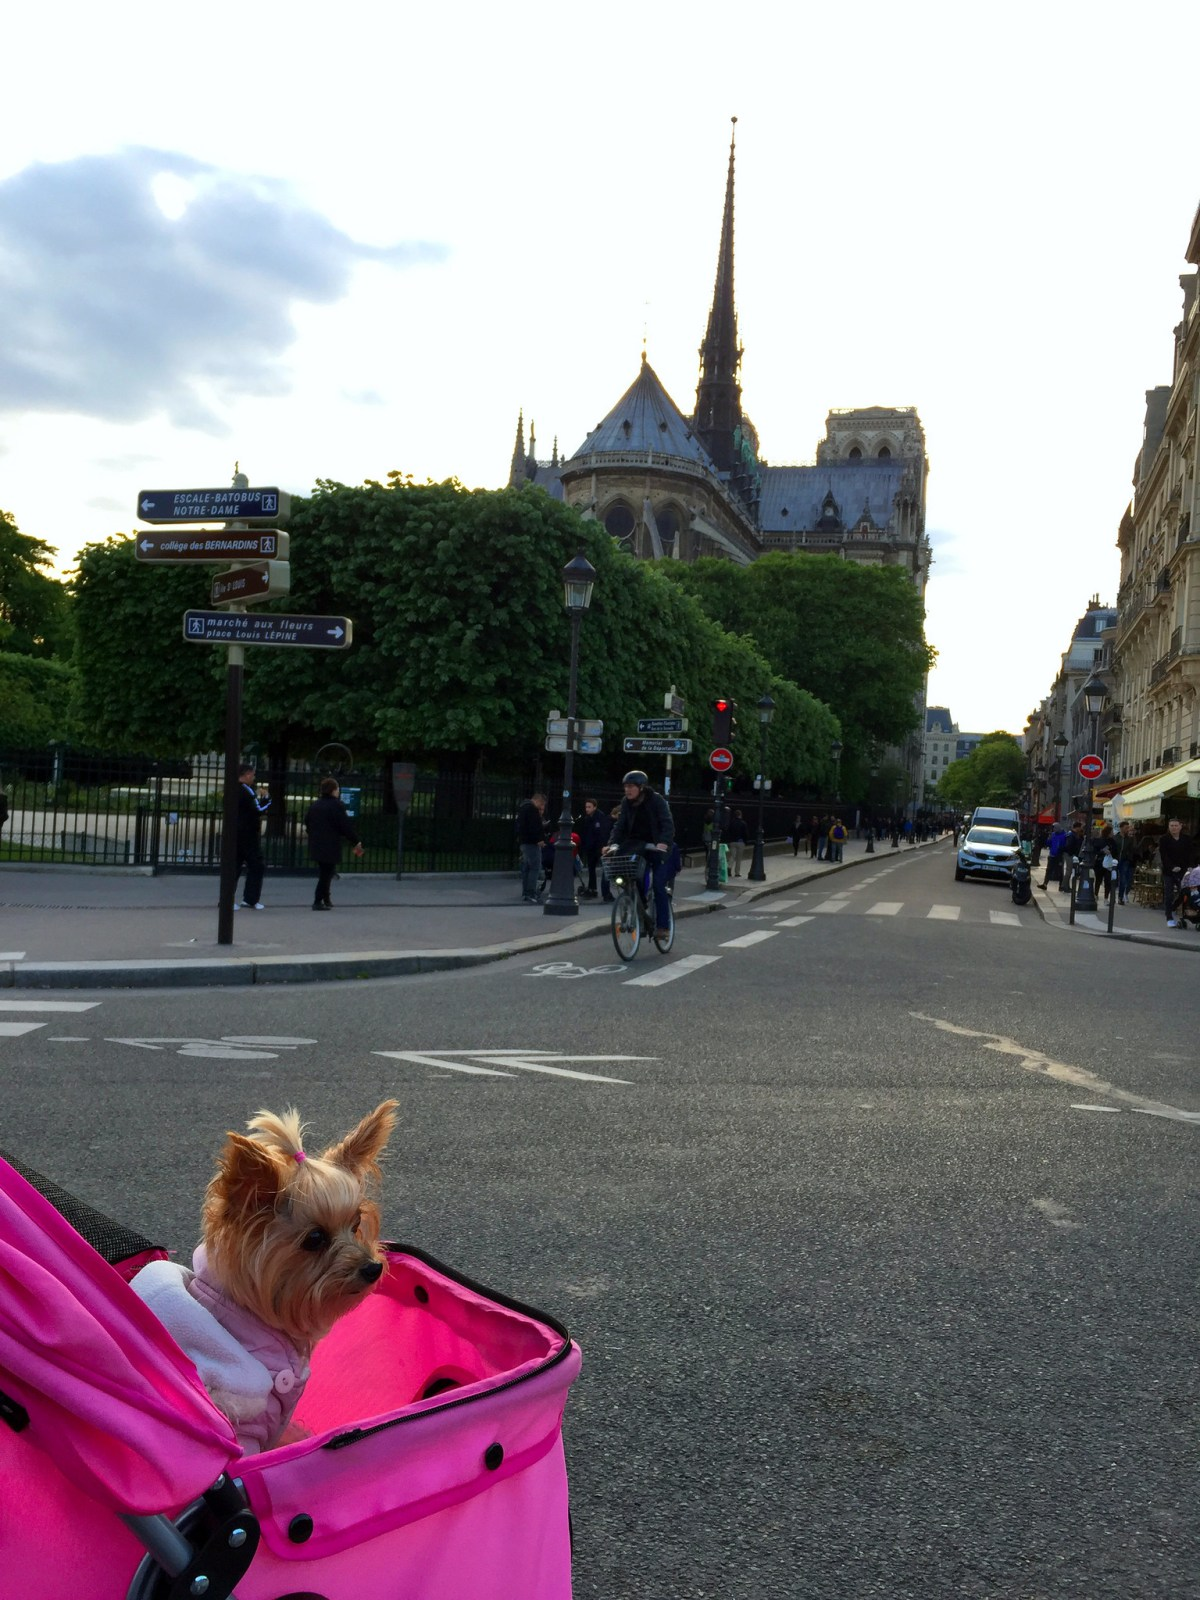 Viajar a Paris con Perro - Travel to Paris with dog viajar a paris con perro Viajar a Paris con perro 34601424555 2a54ff0f69 k